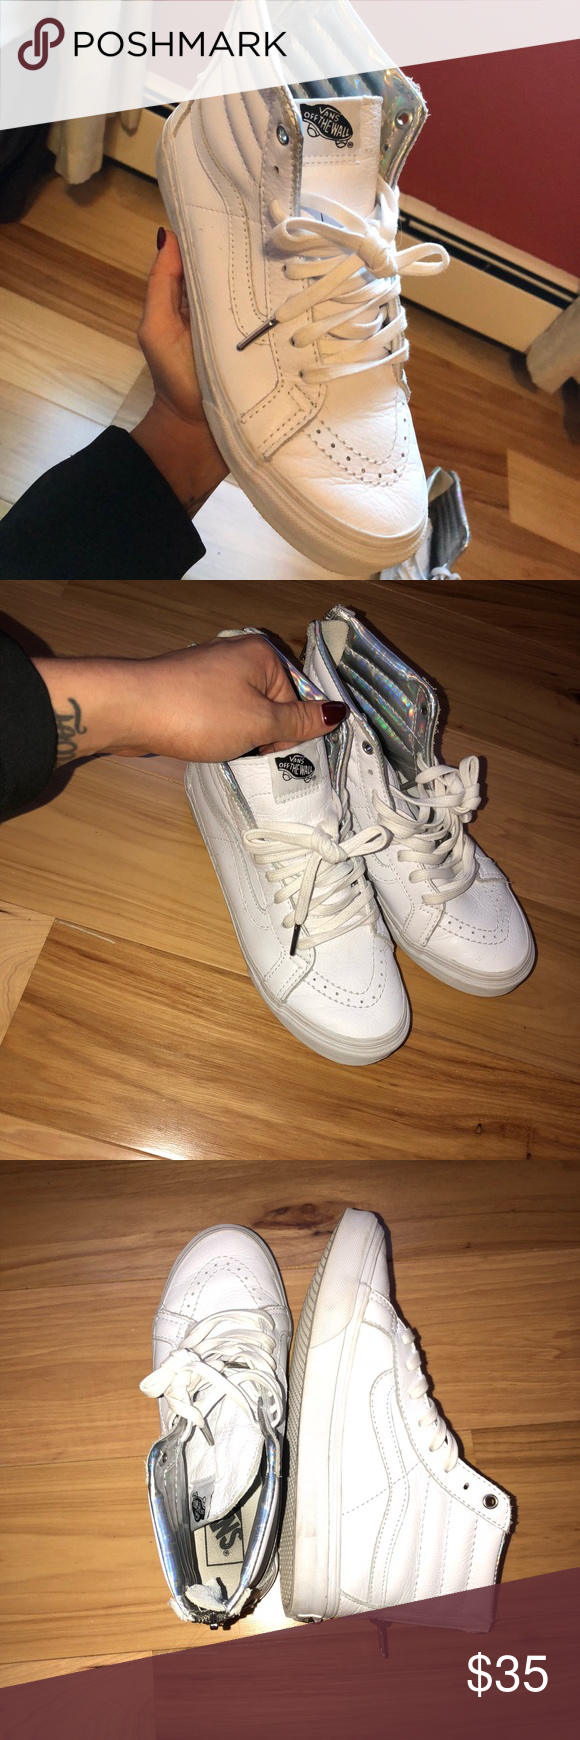 73ee1125b4 Vans sk8- Hi Slim zip true white sneakers Vans sk8- Hi Slim zip true white  sneakers. These shoes have been worn a few times . Still true white color.